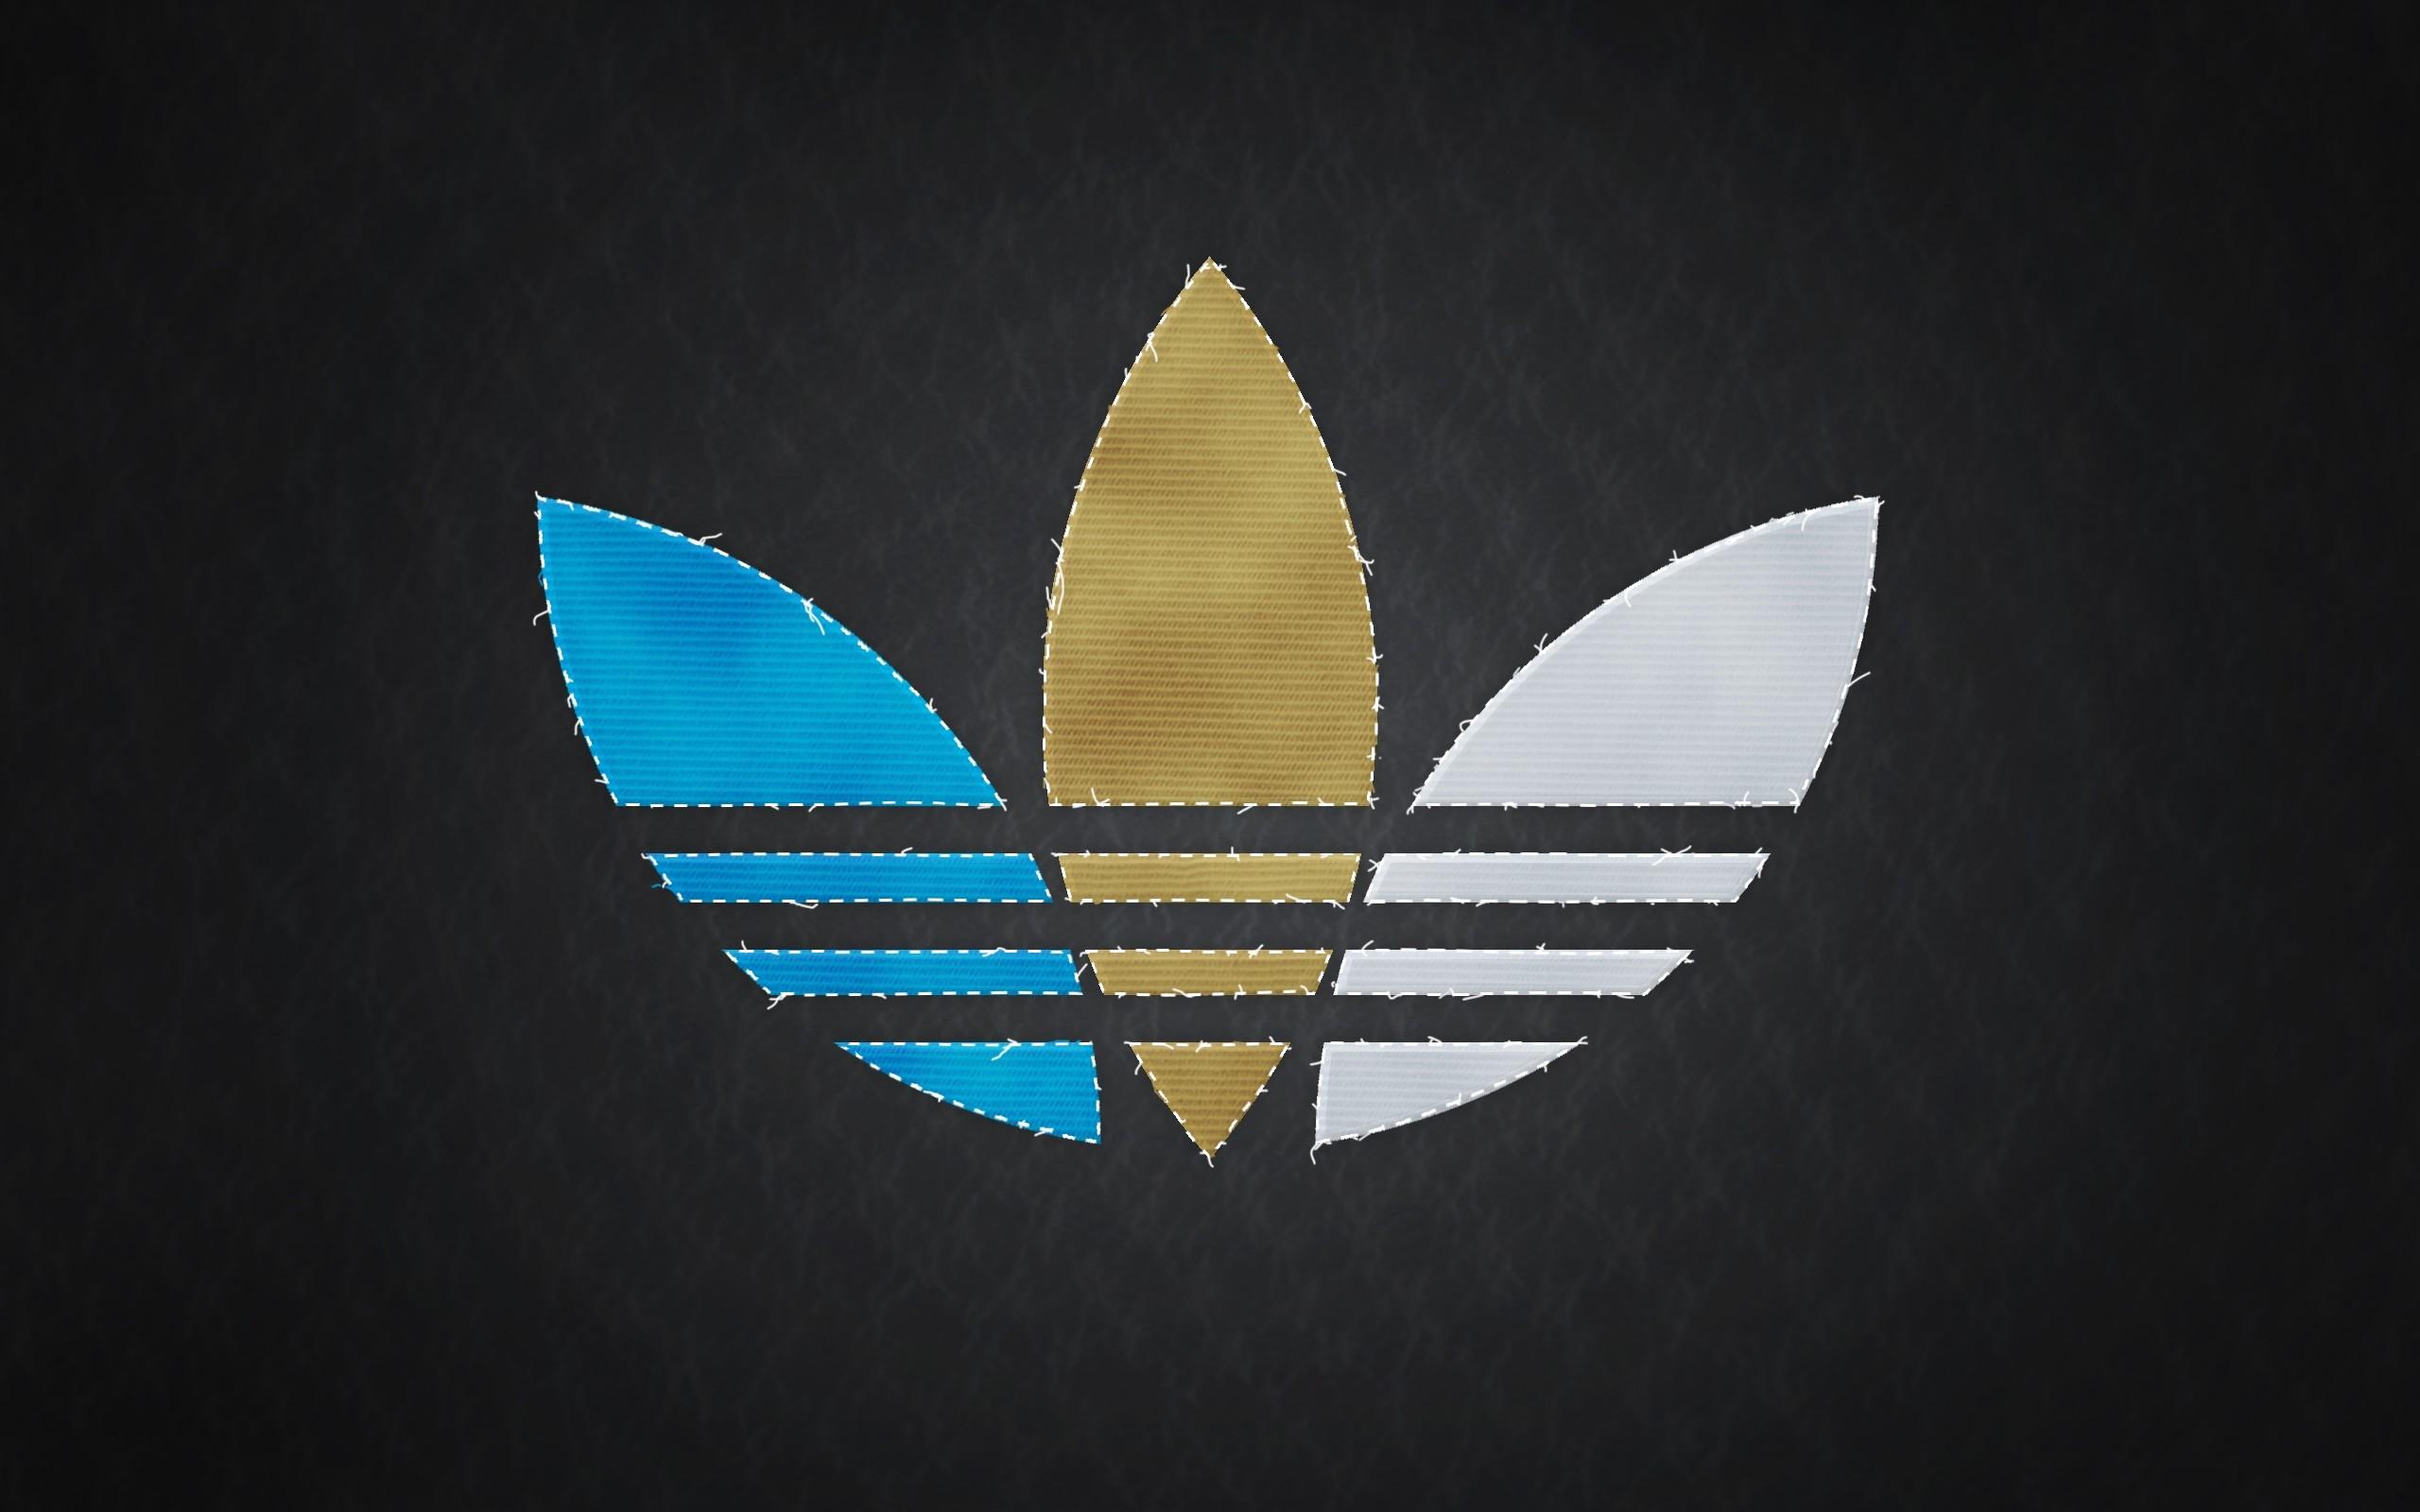 addidas wallpaper, adidas logo wallpaper